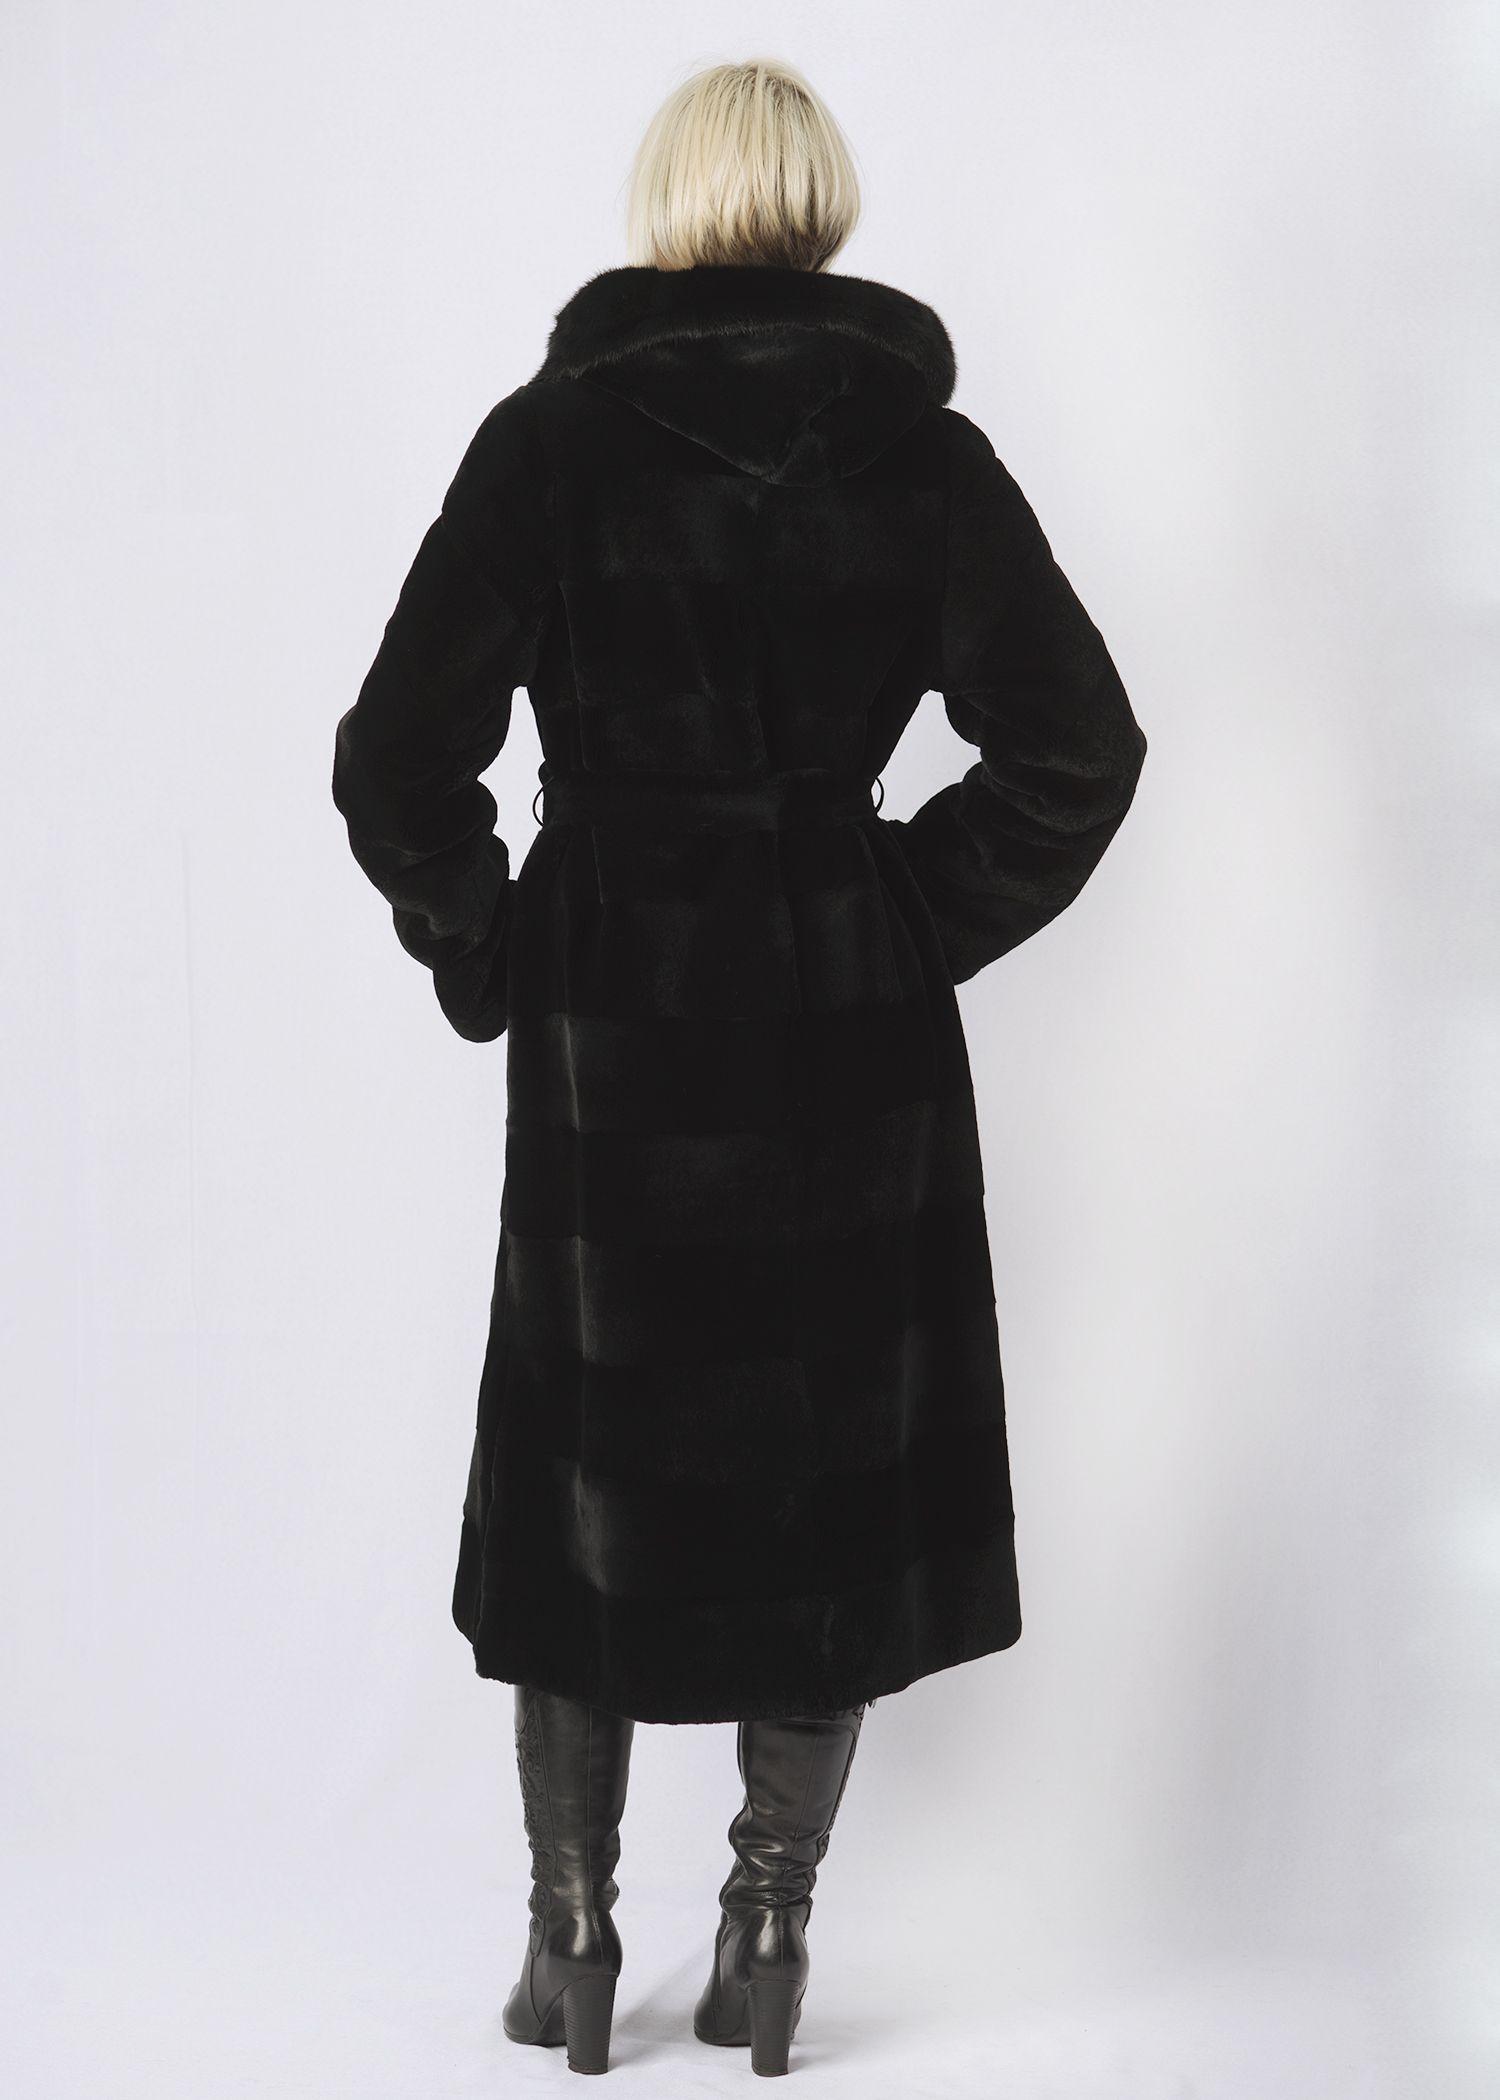 Шуба женская из бобрика(rex) ОА1259-1 фото №1